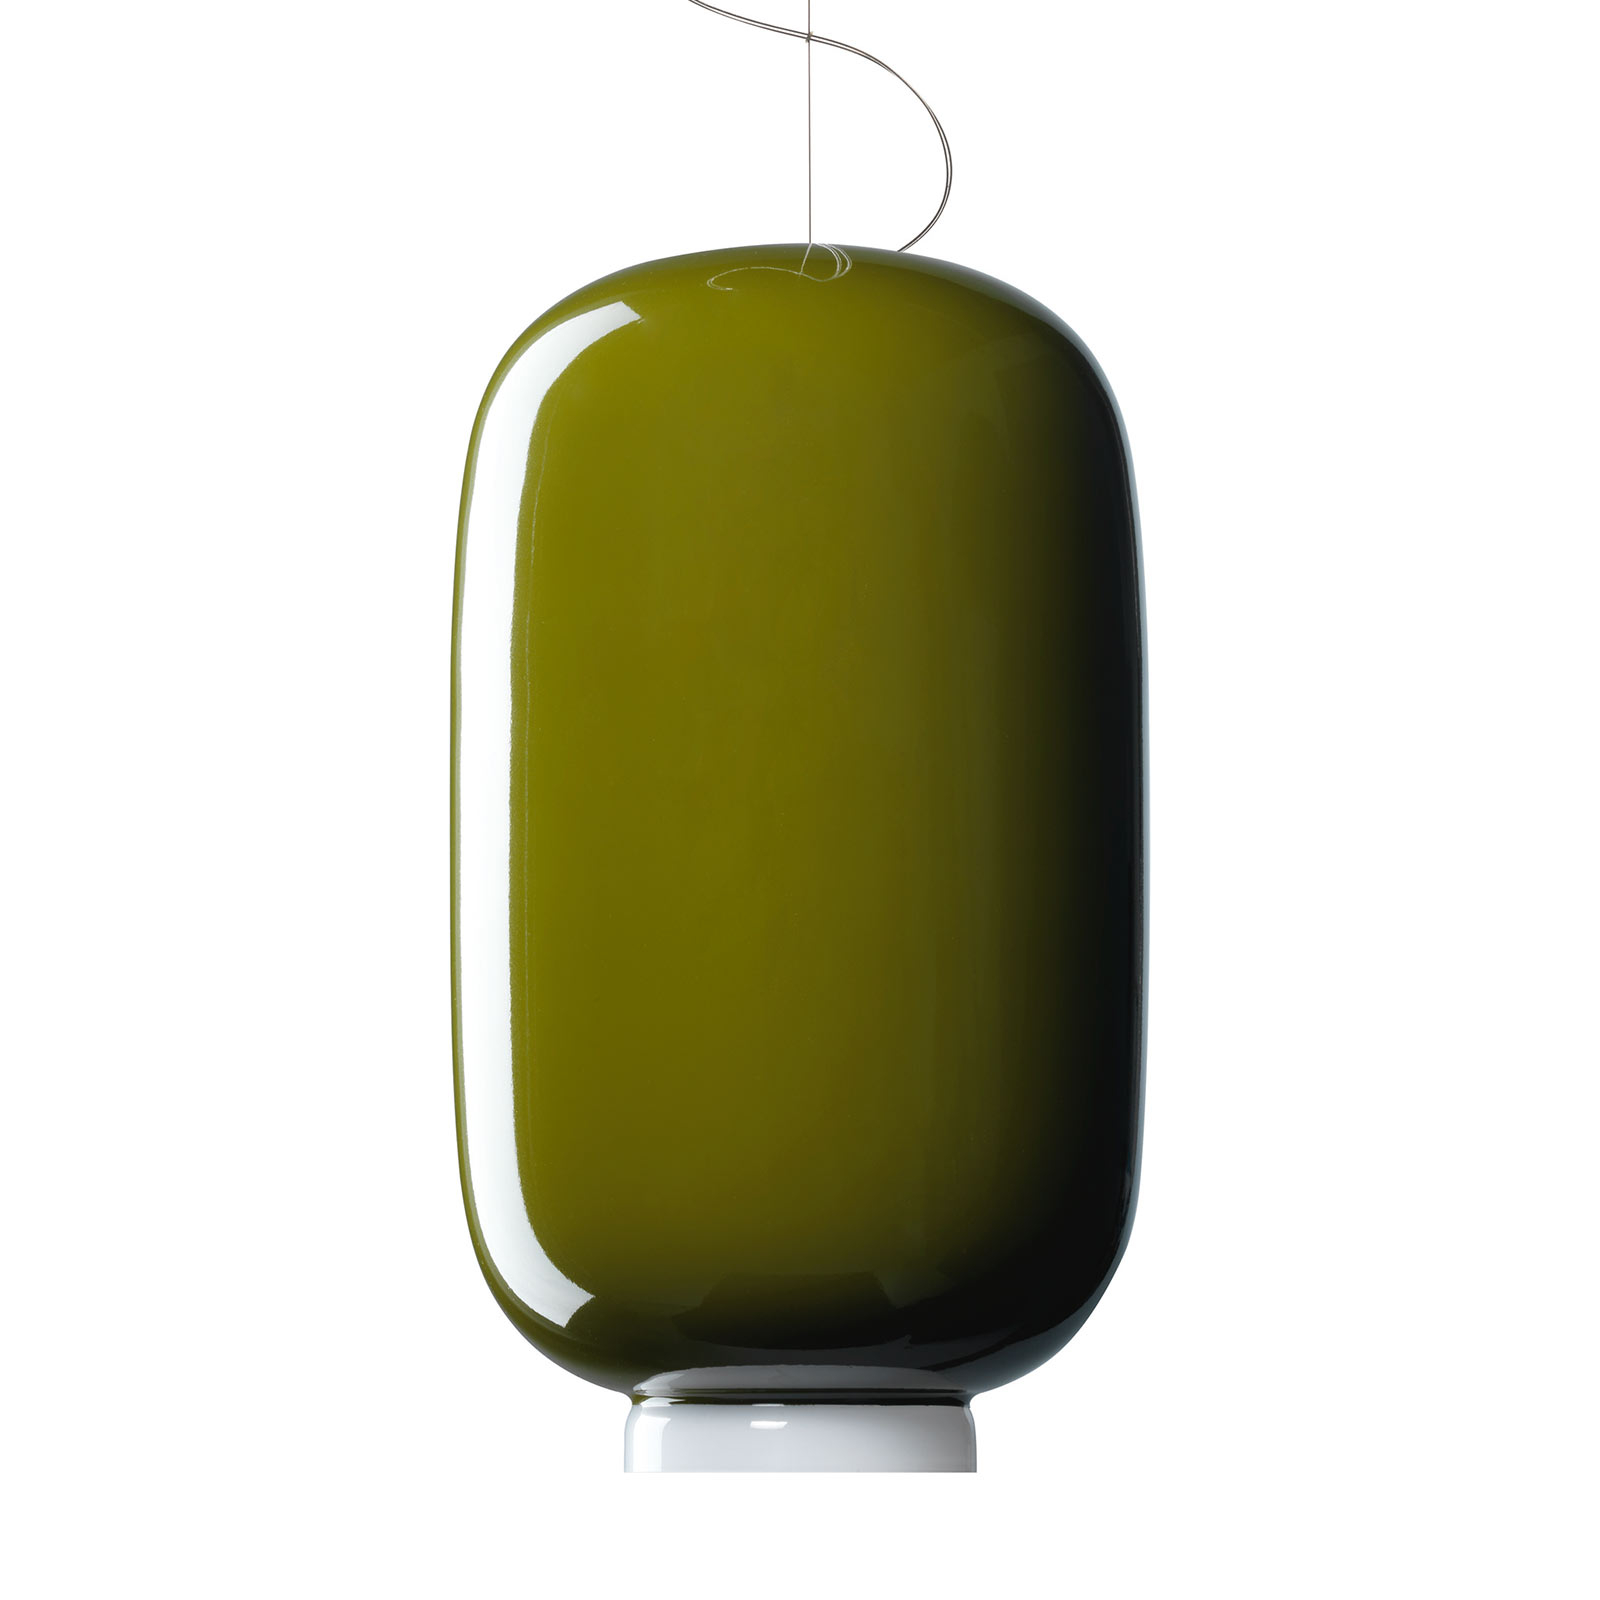 Foscarini MyLight Chouchin 2 LED-hængelampe, grøn